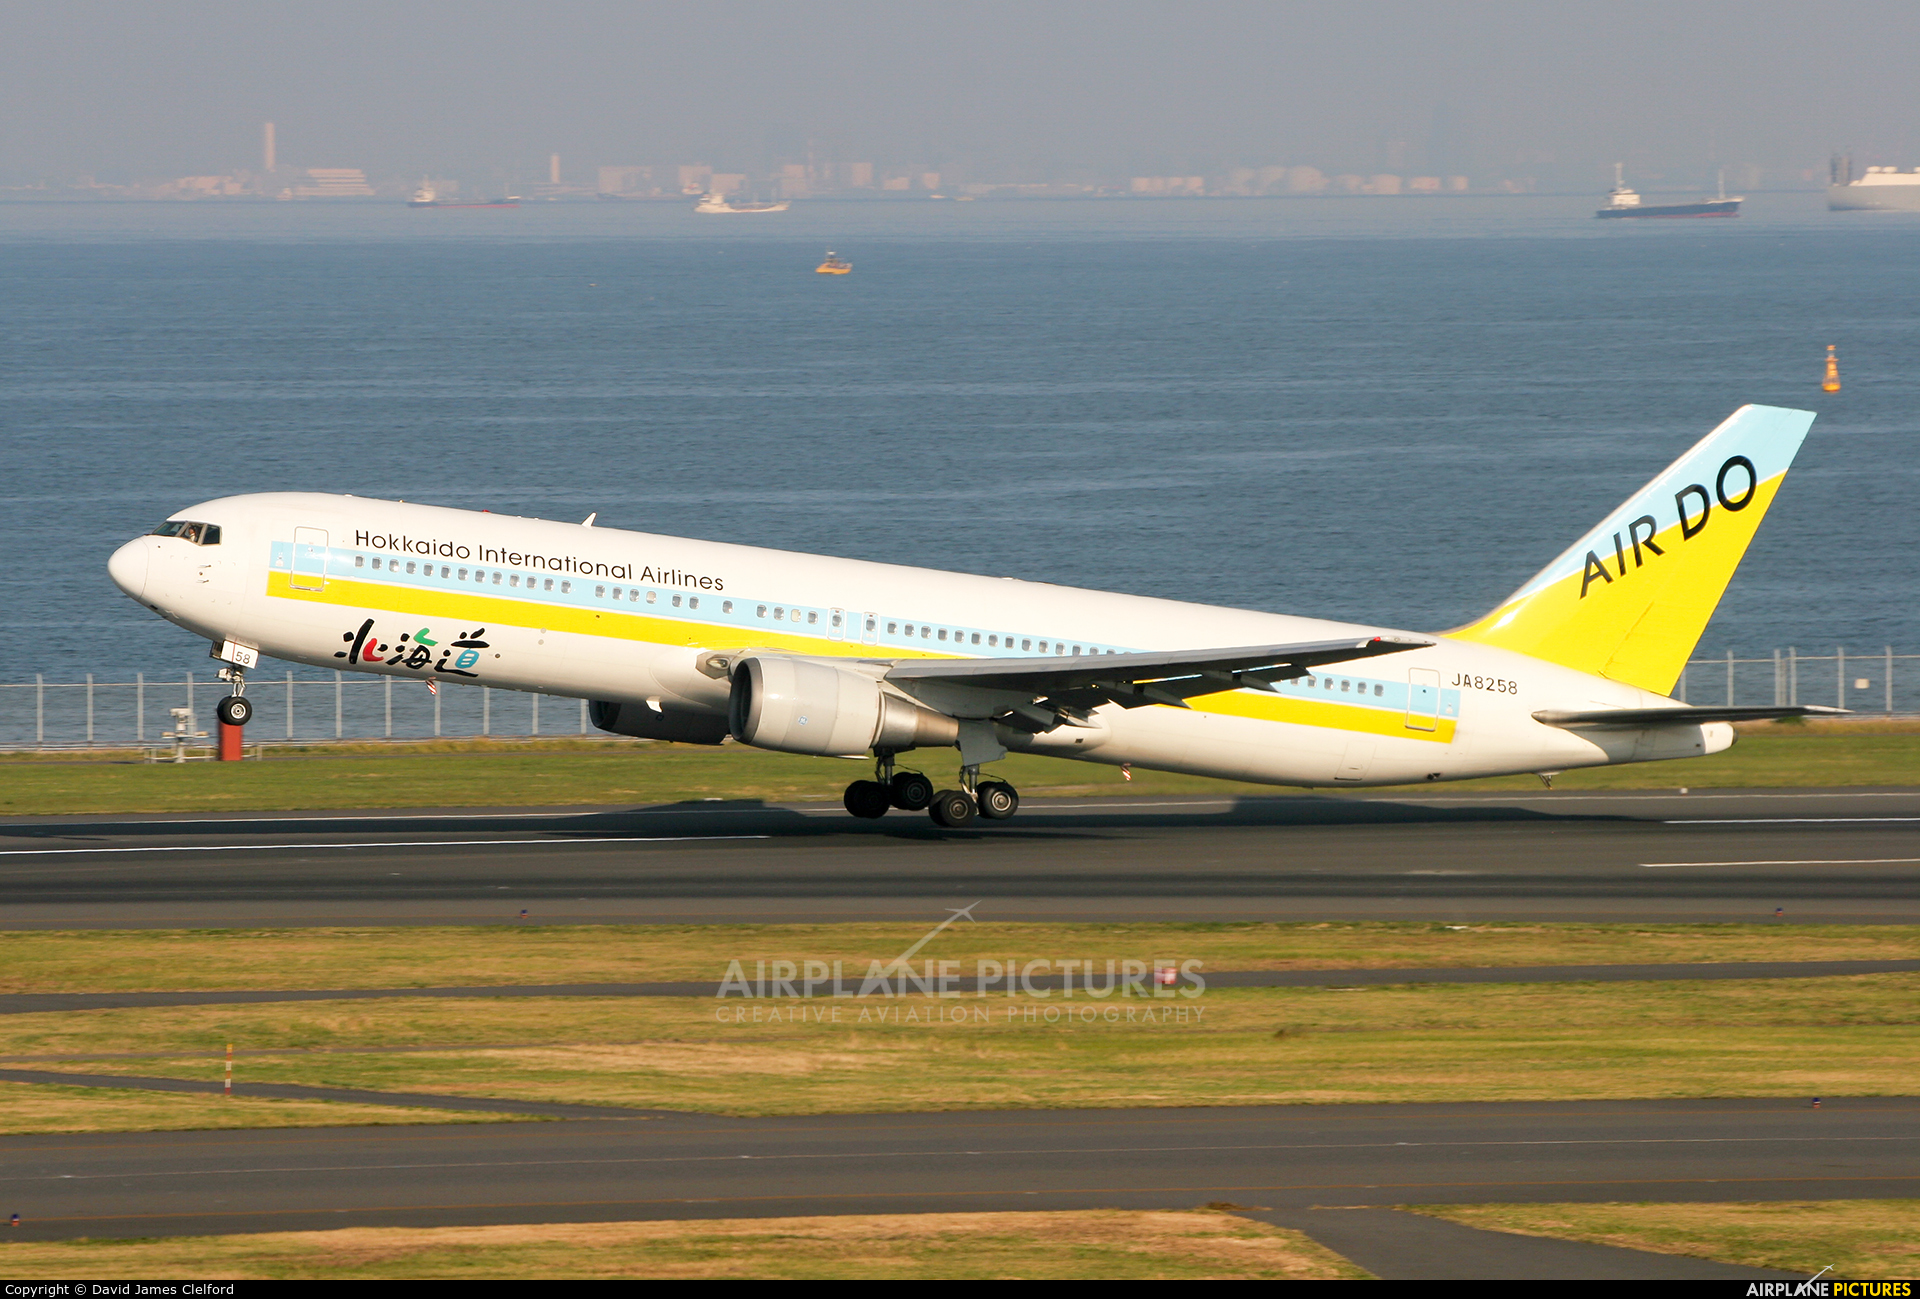 Air Do - Hokkaido International Airlines JA8258 aircraft at Tokyo - Haneda Intl